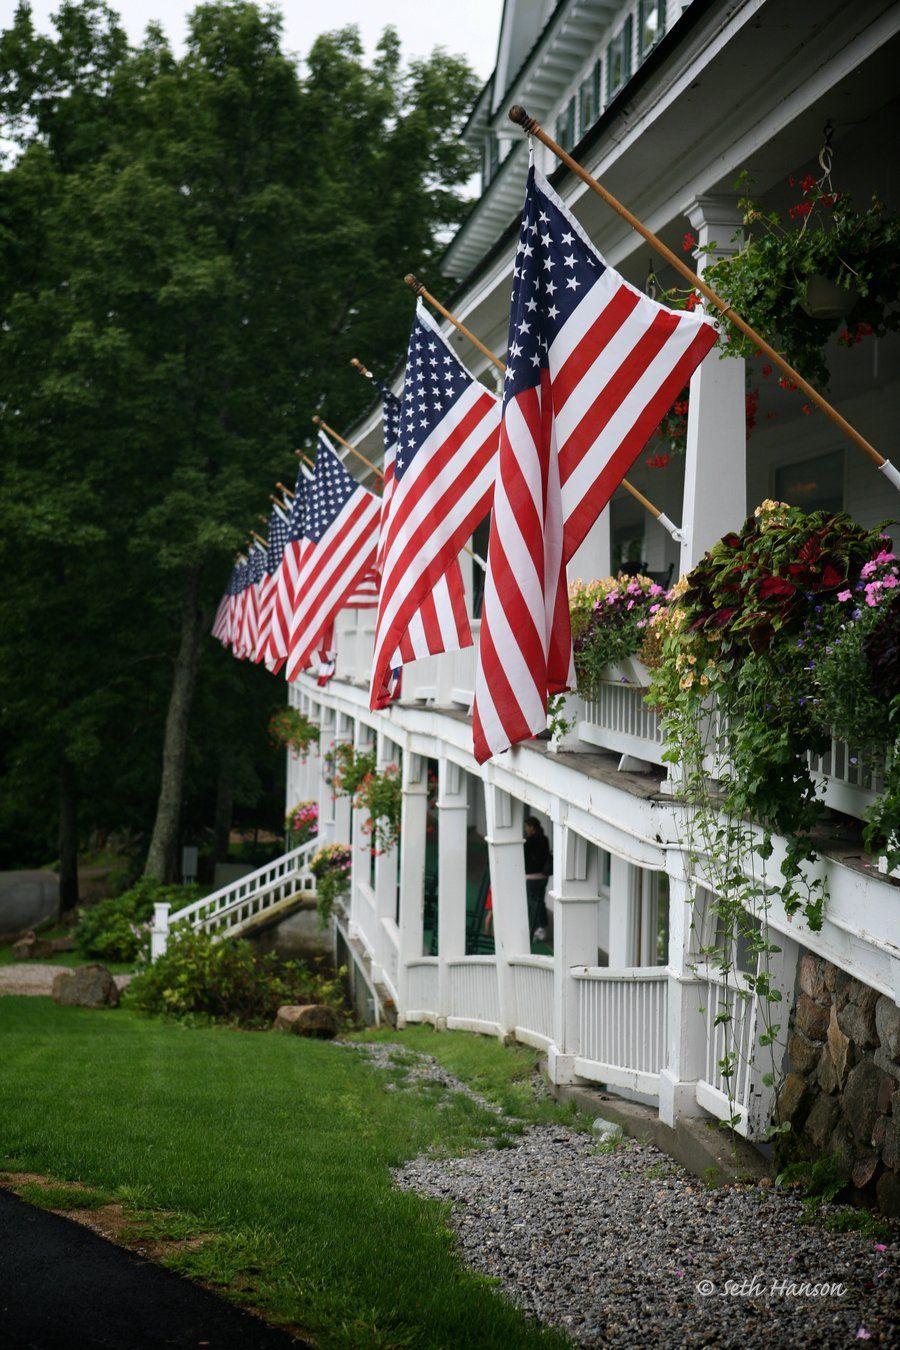 Grand Porch By Smhanson On Deviantart I Love America God Bless America Patriotic Holidays